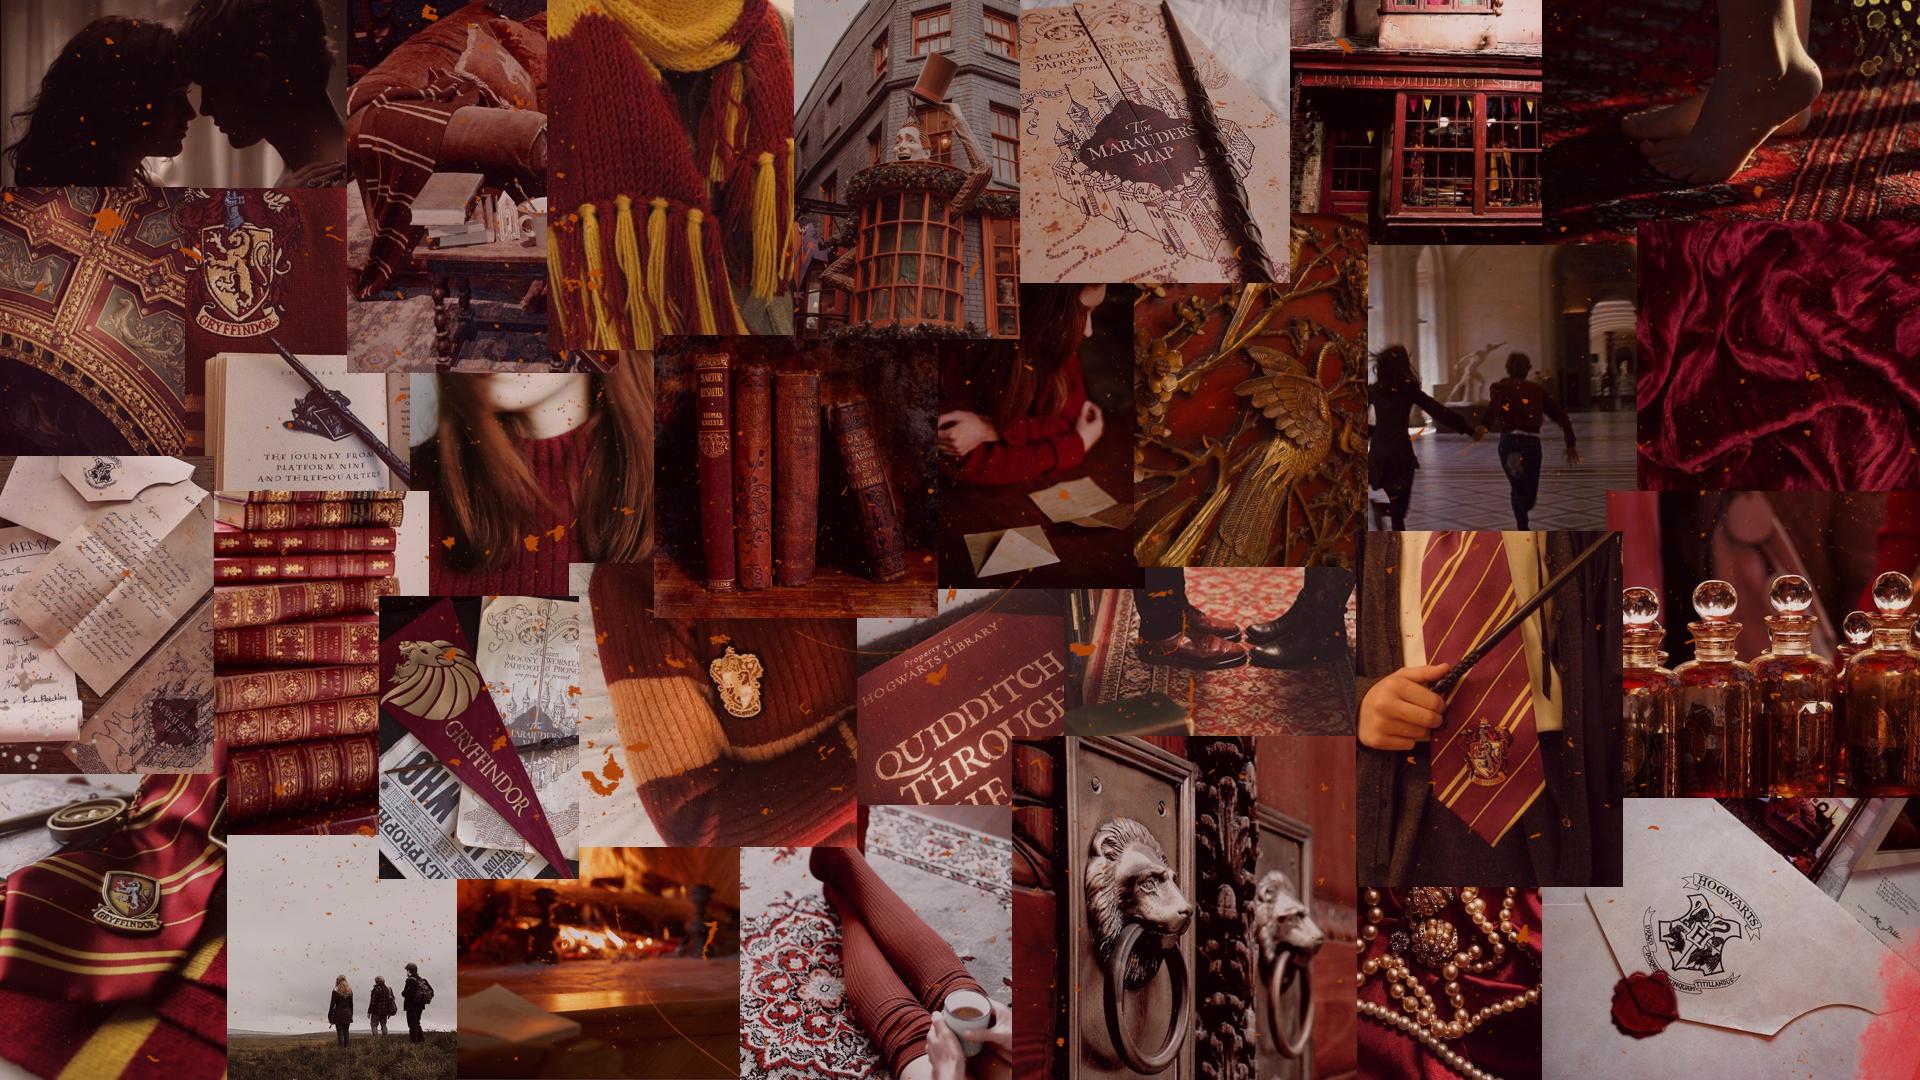 Gryffindor Desktop Wallpaper Desktop Wallpaper Harry Potter Harry Potter Wallpaper Gryffindor Aesthetic